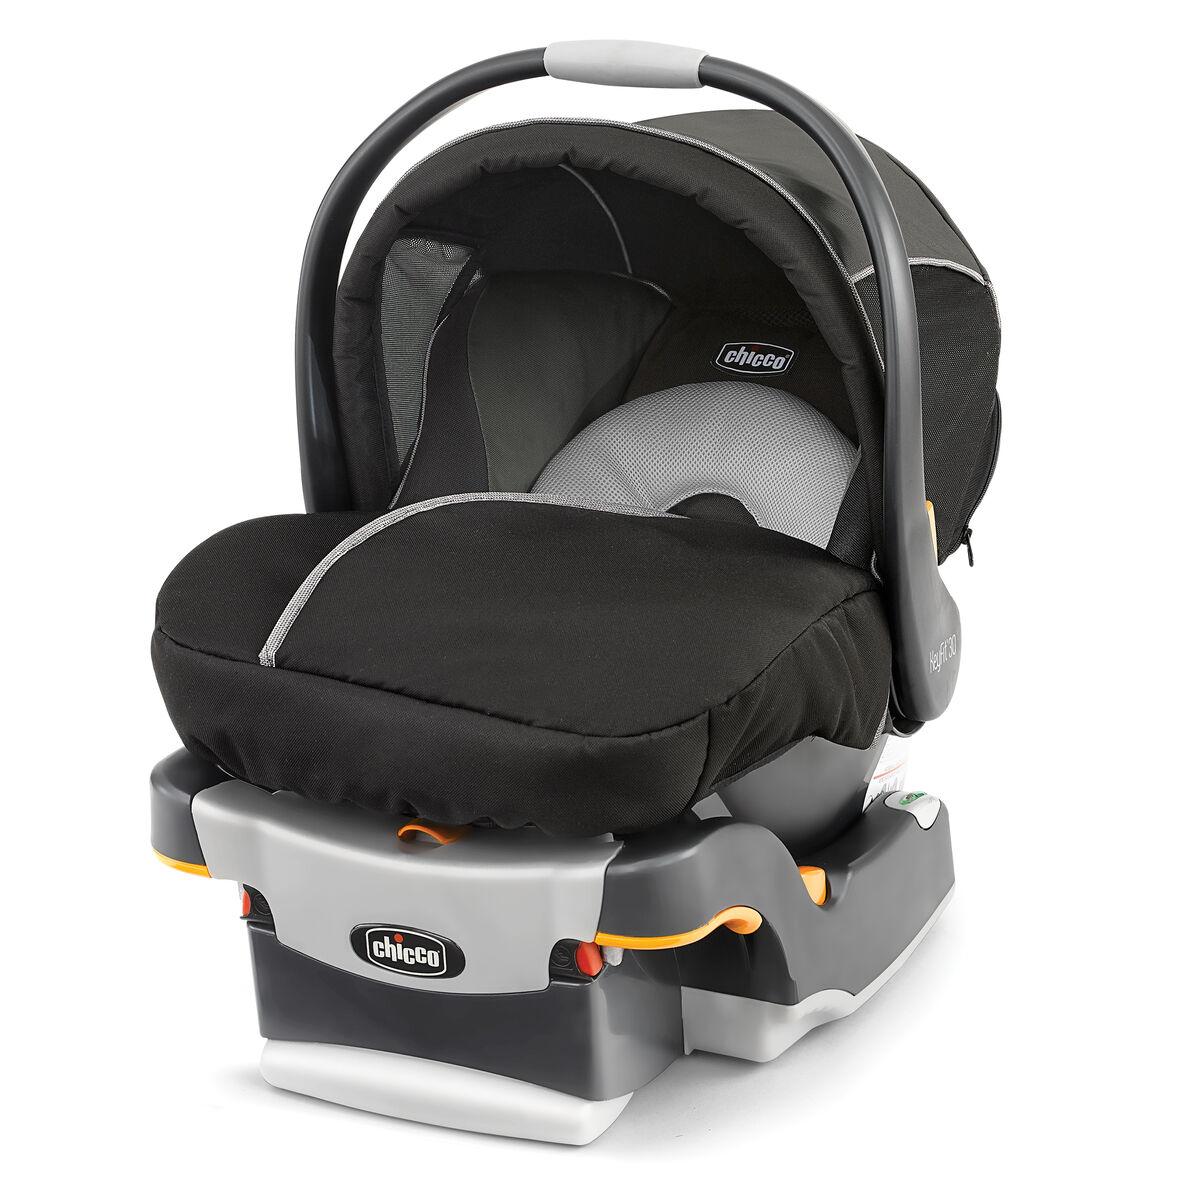 Chicco Keyfit Magic Infant Car Seat Coal